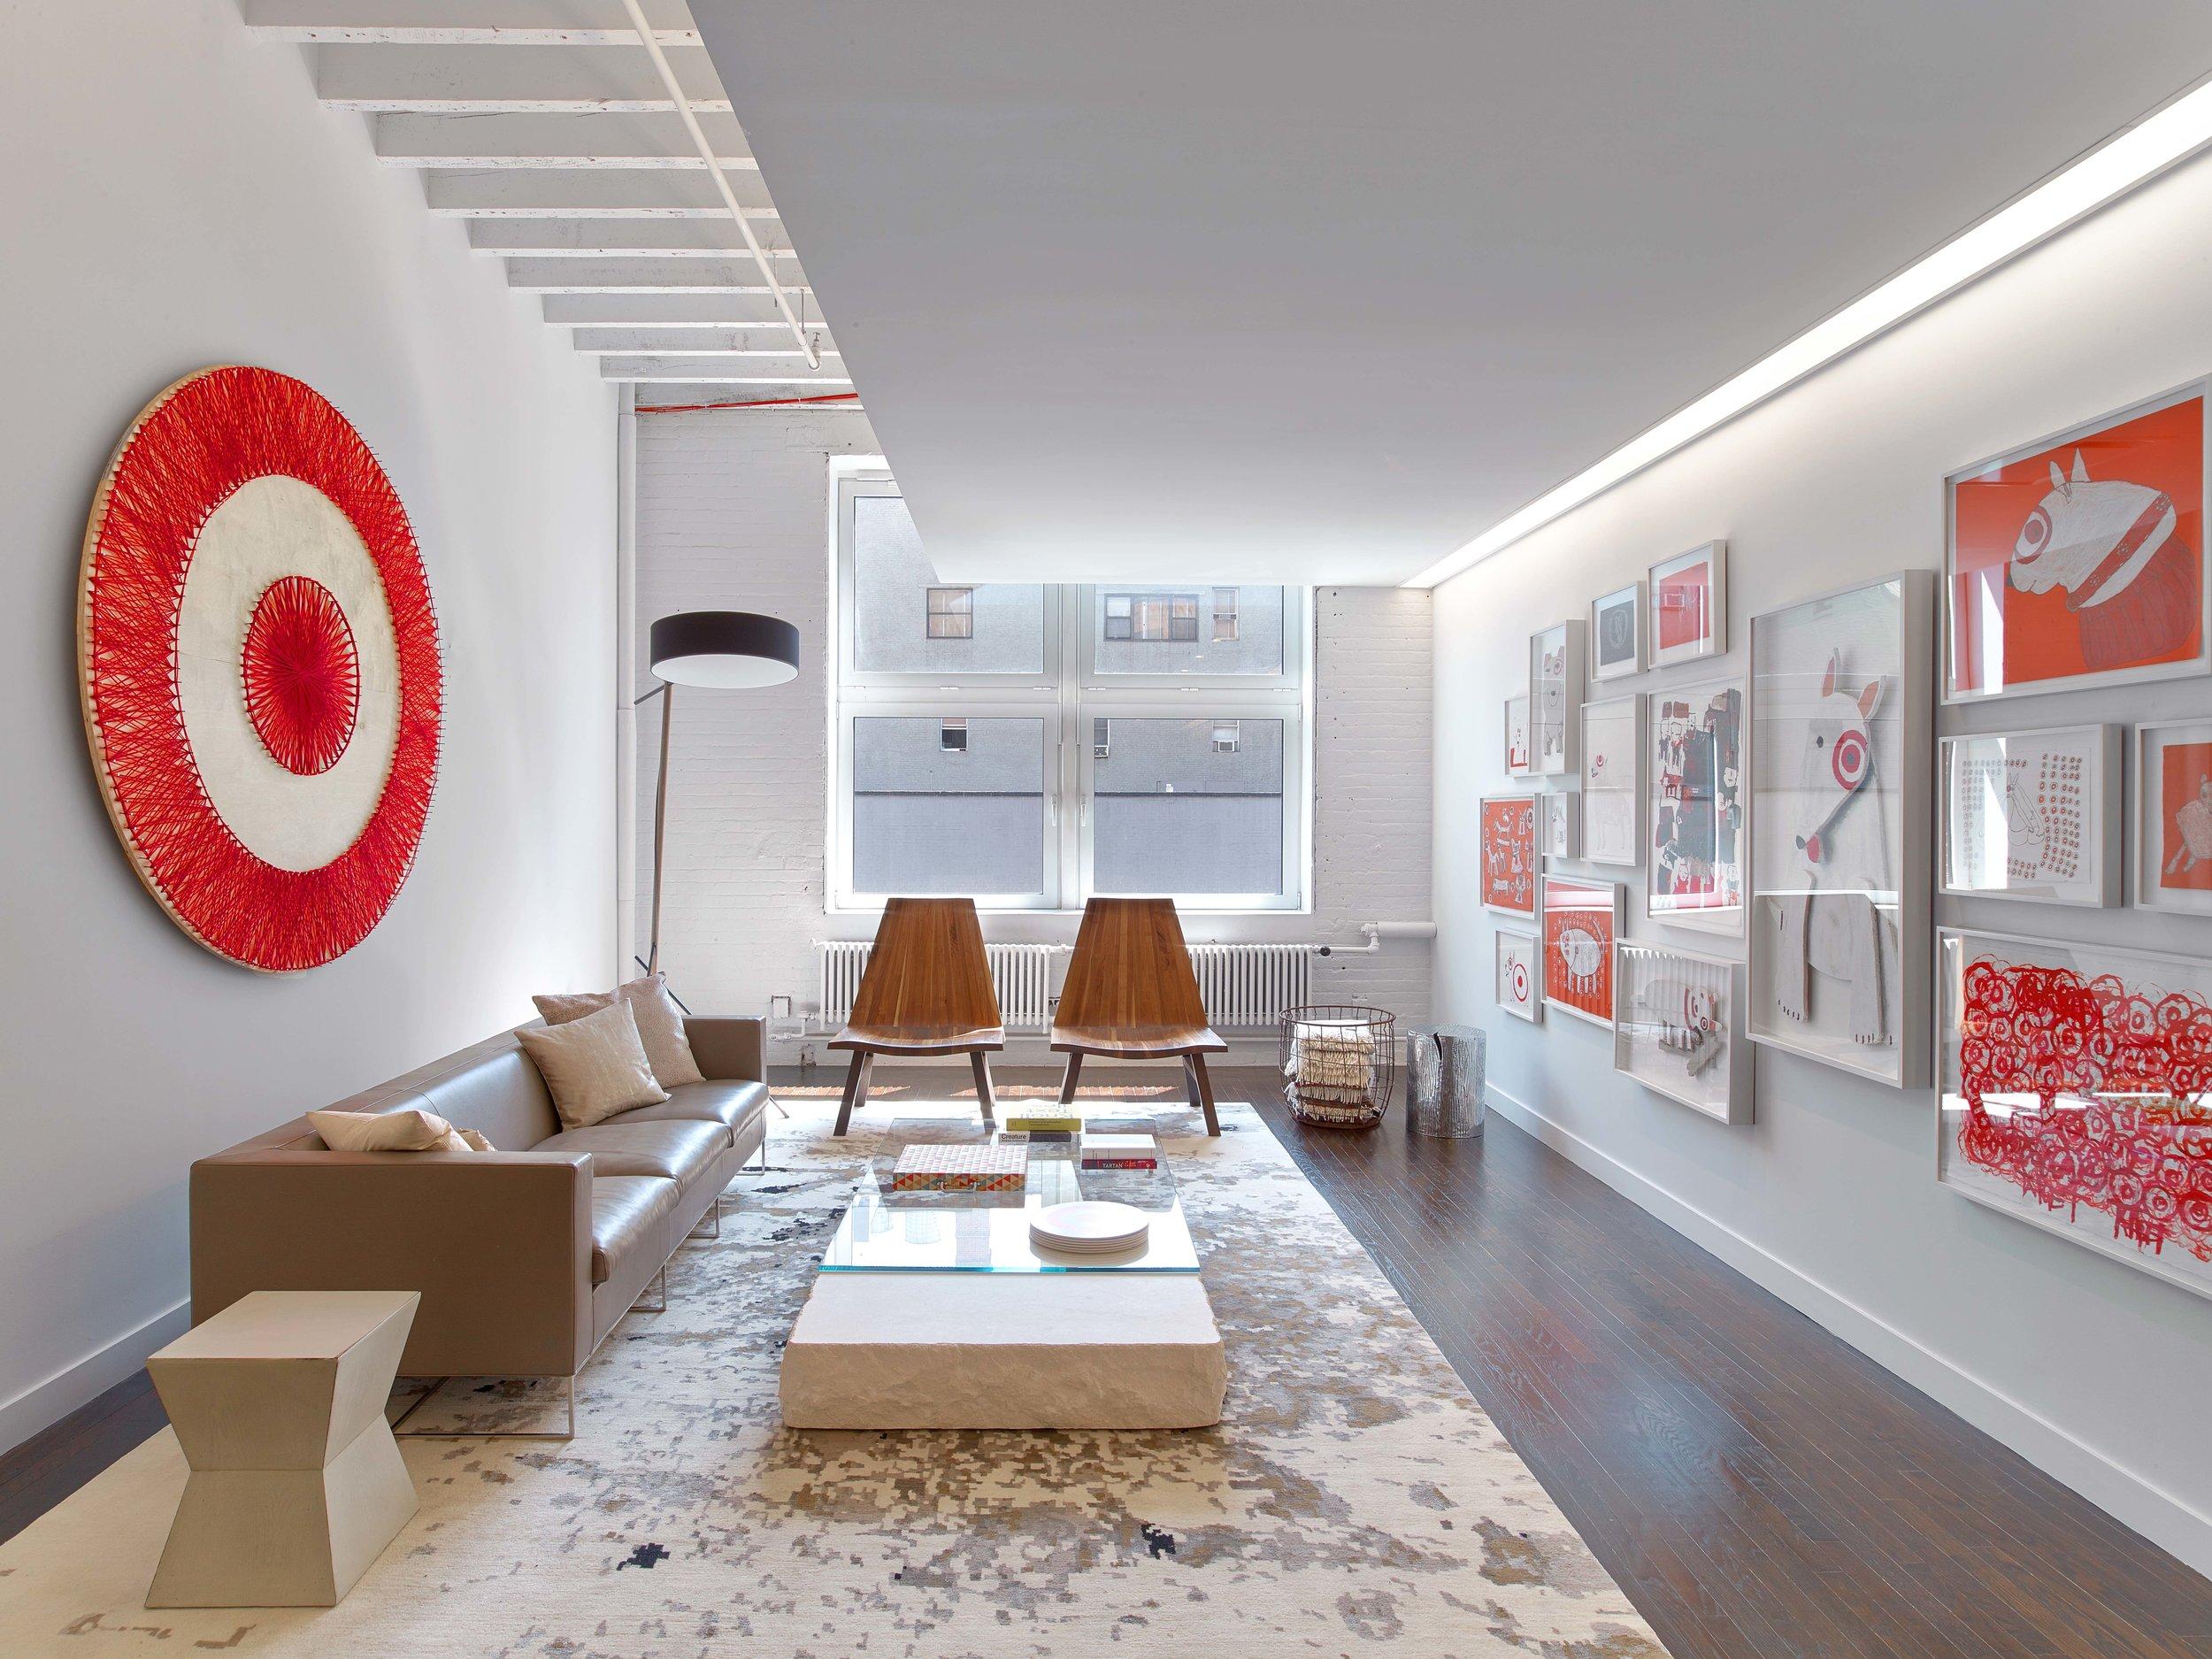 ashley-liu-target-pr-and-marketing-offices_24834972650_o.jpg